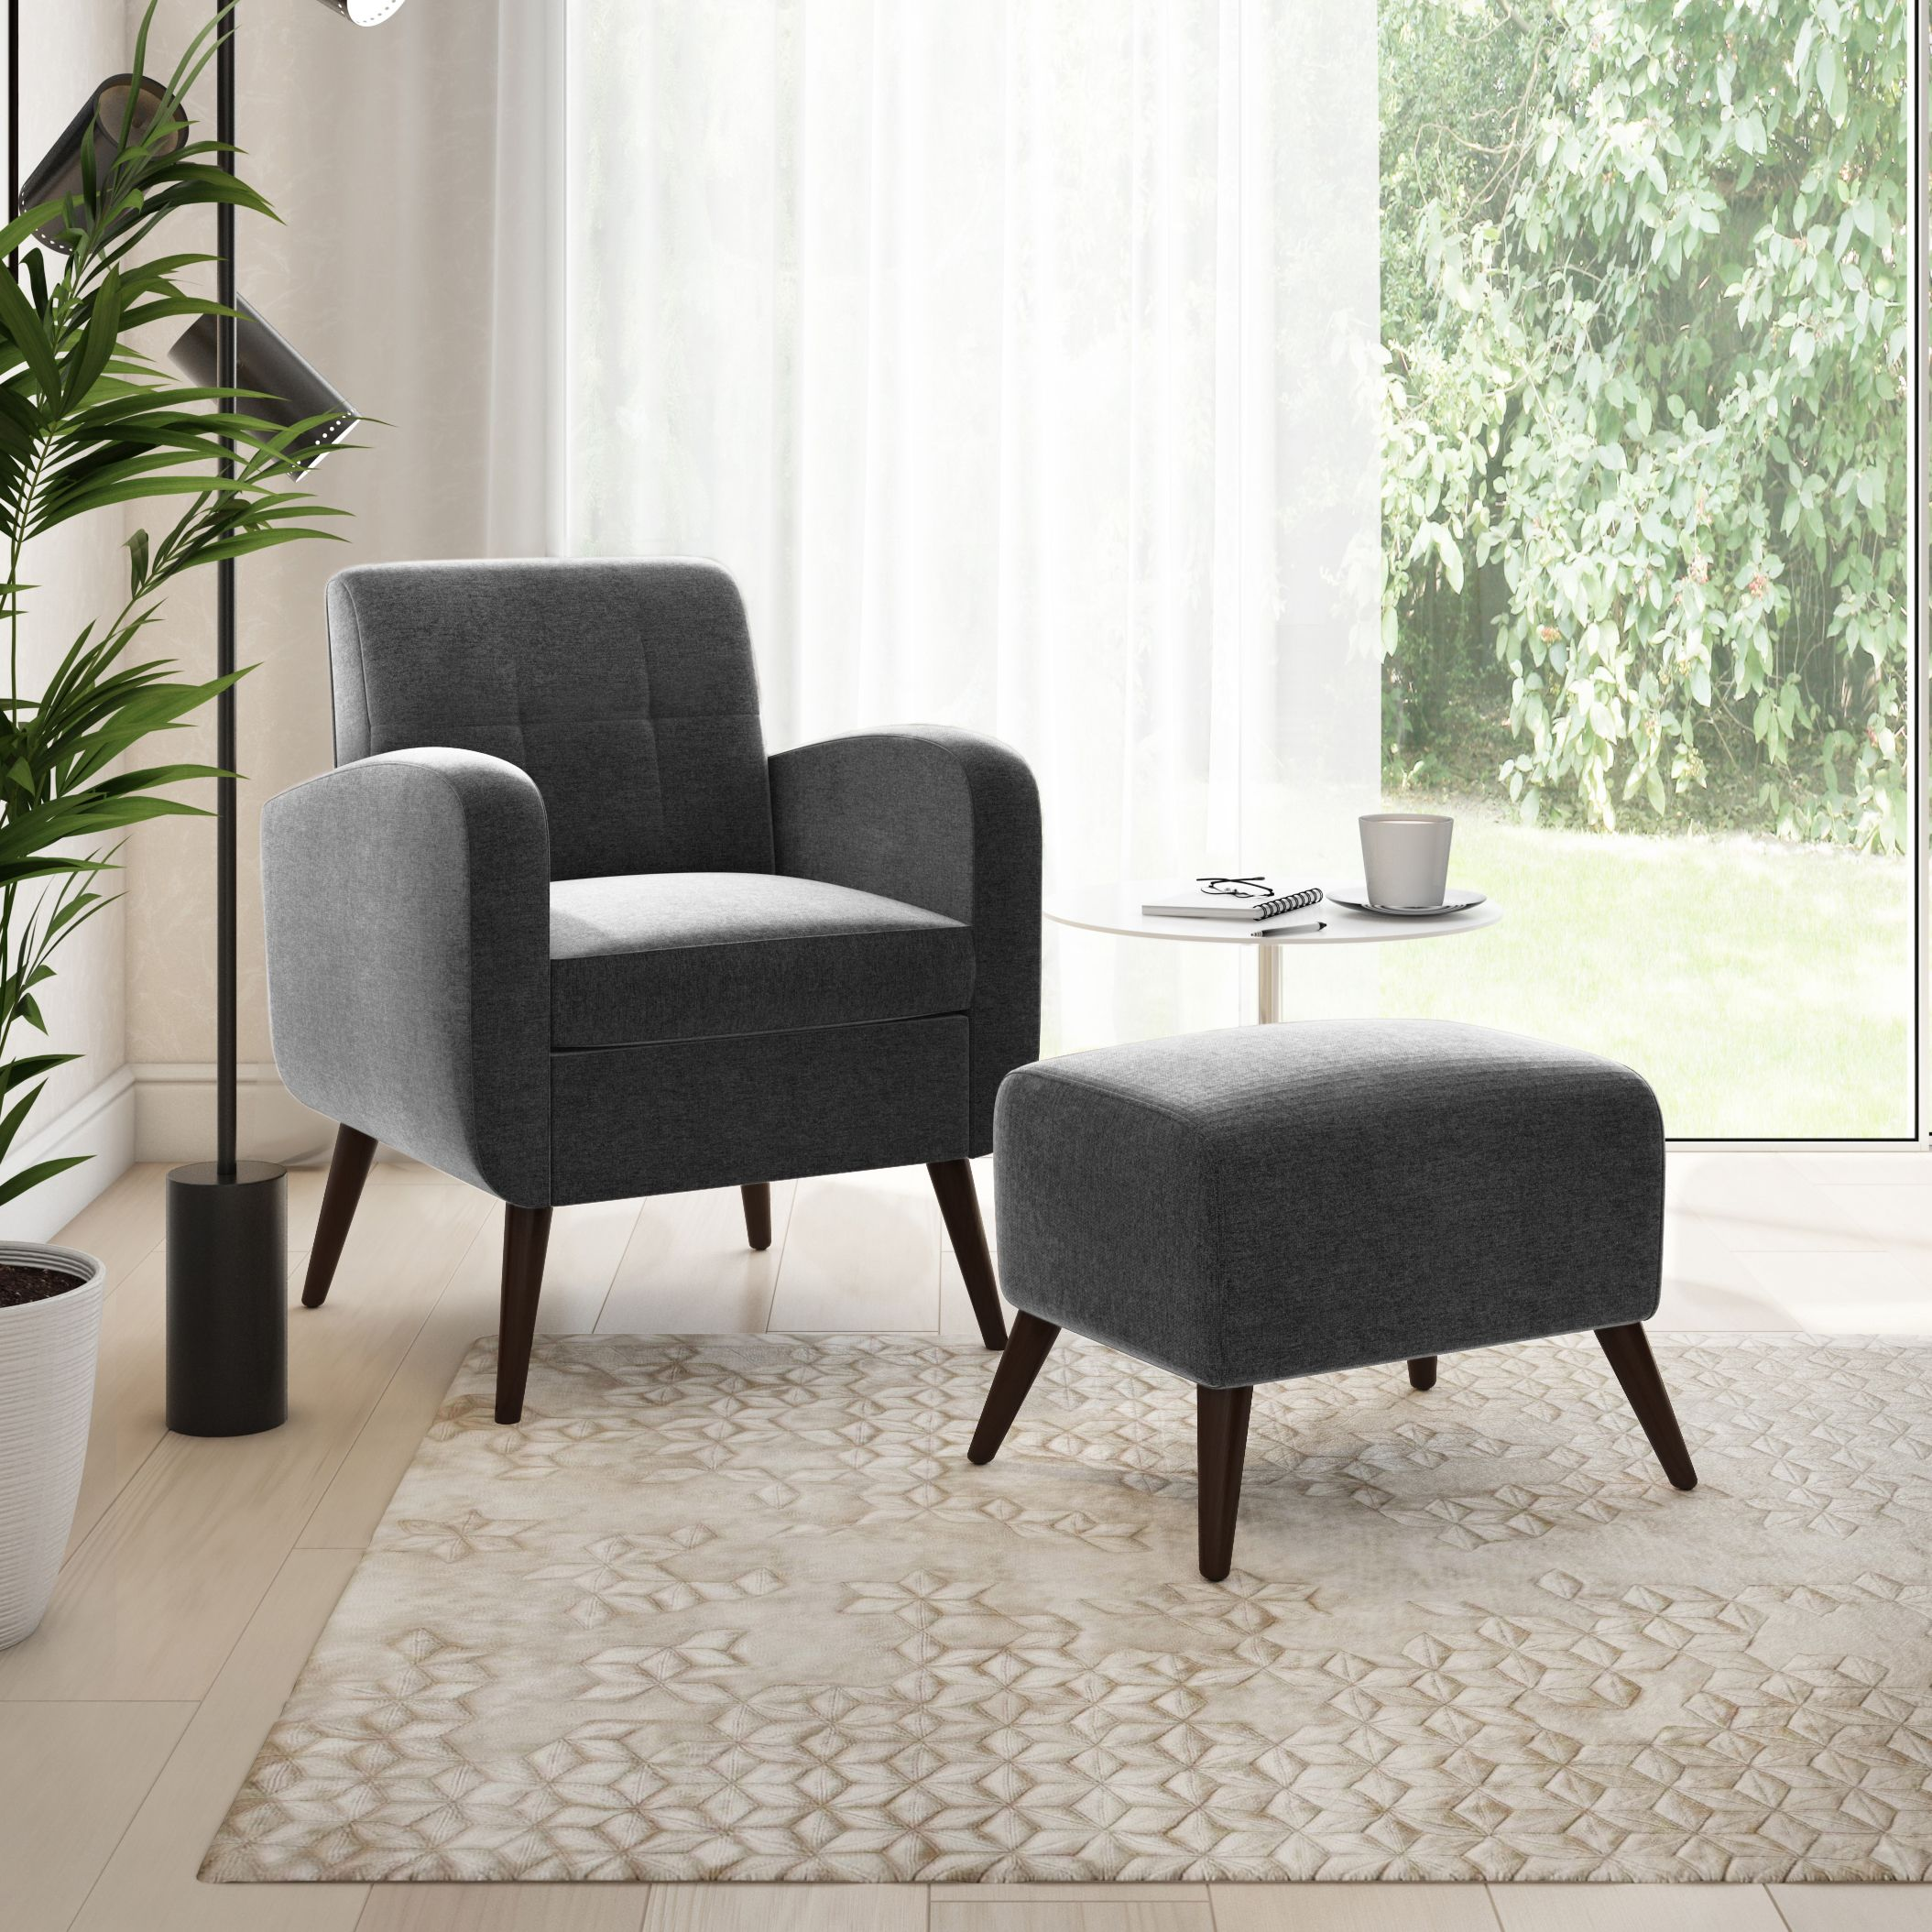 Homesvale suzie velvet arm chair and ottoman